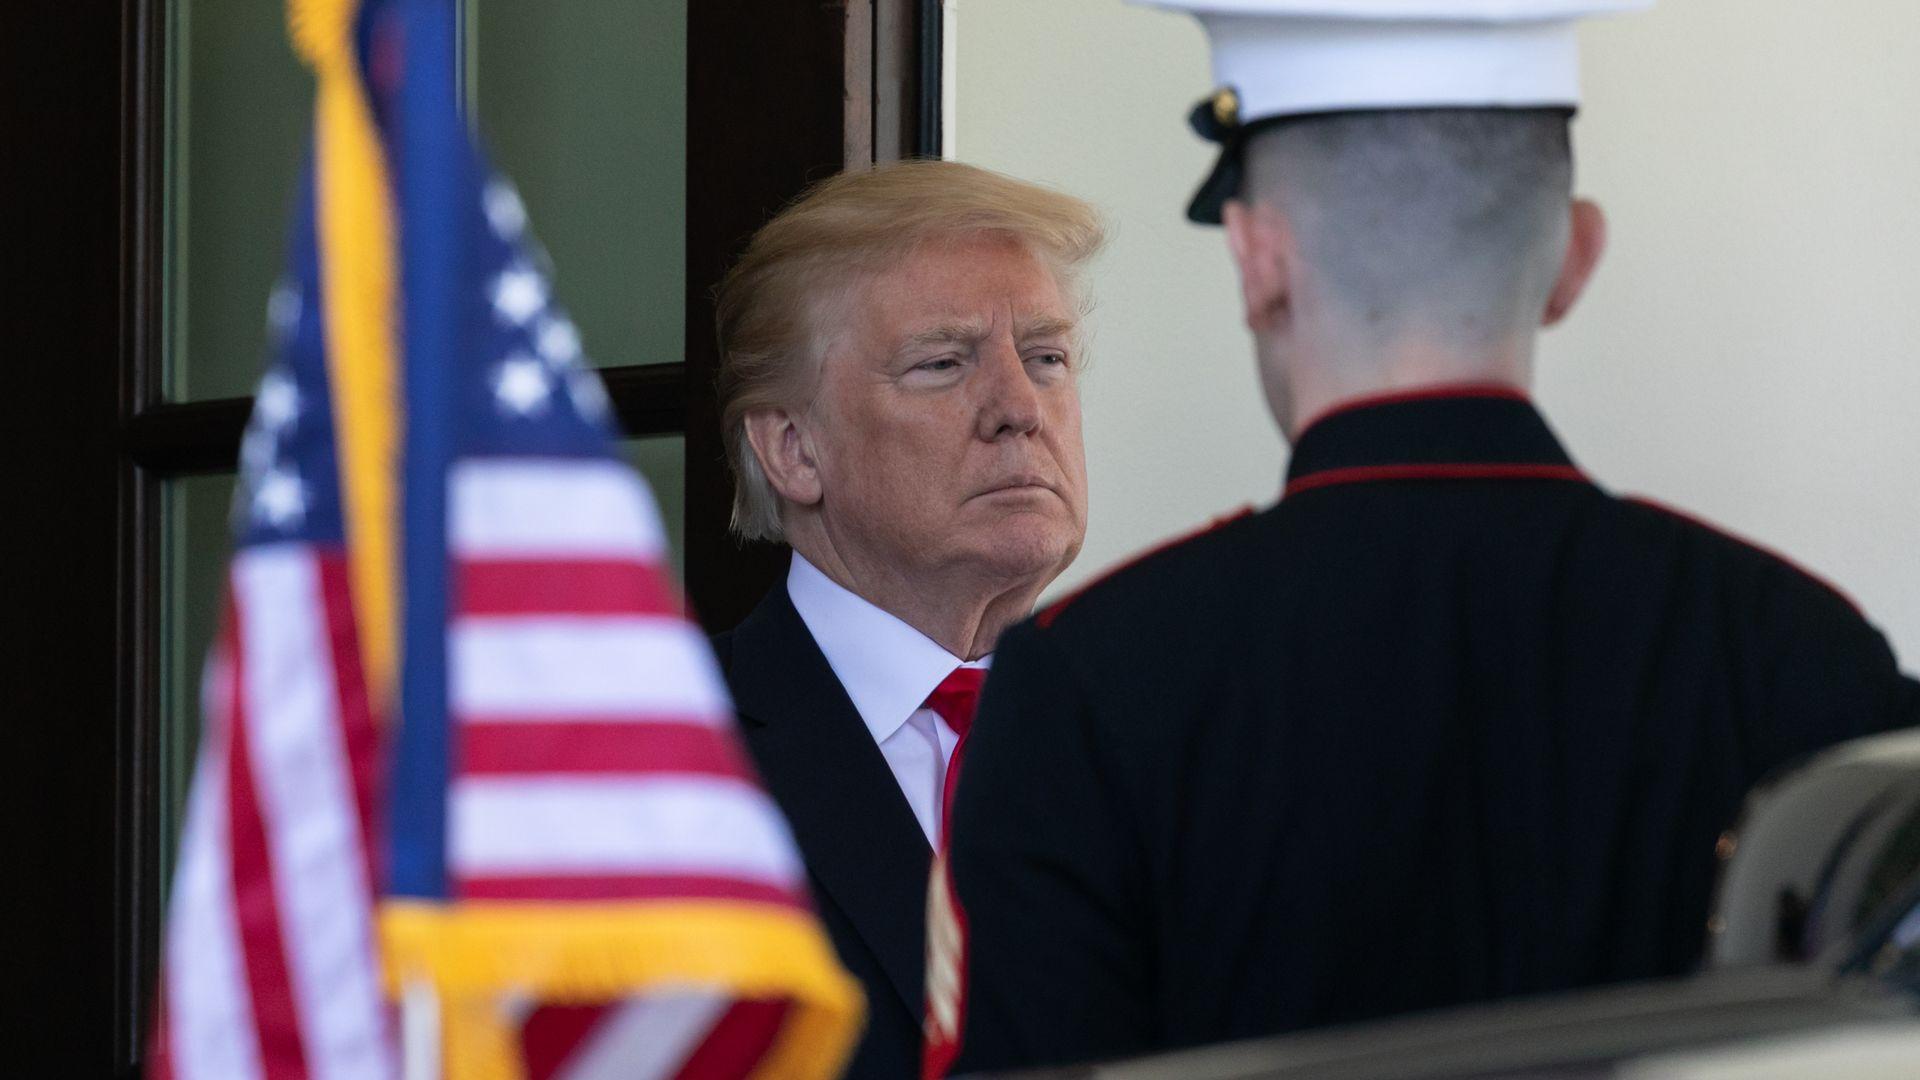 President Trump near an American flag.